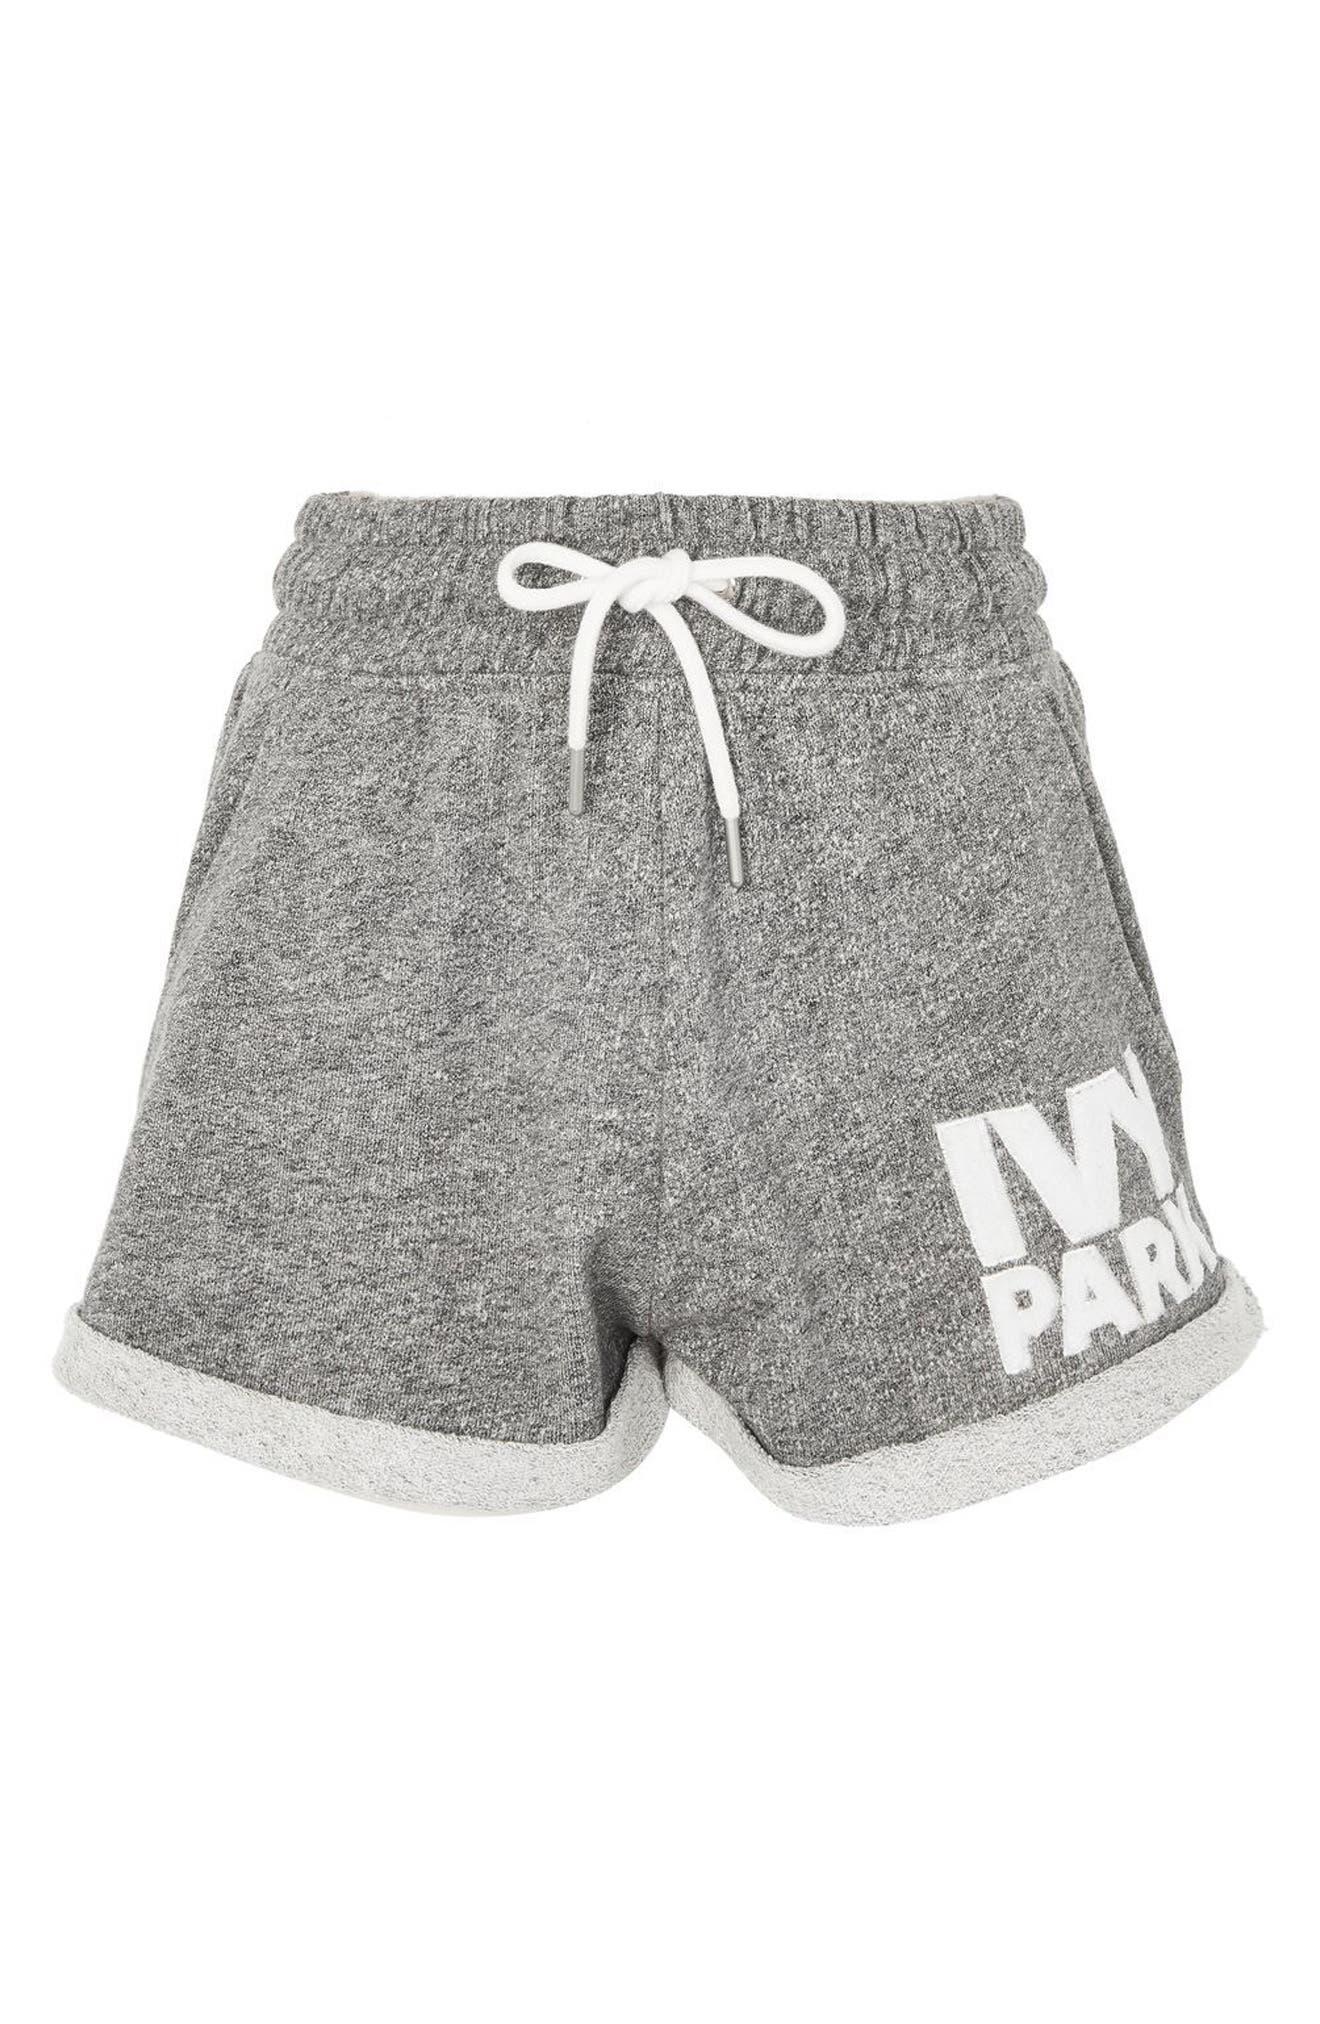 IVY PARK® Chenille Logo Shorts